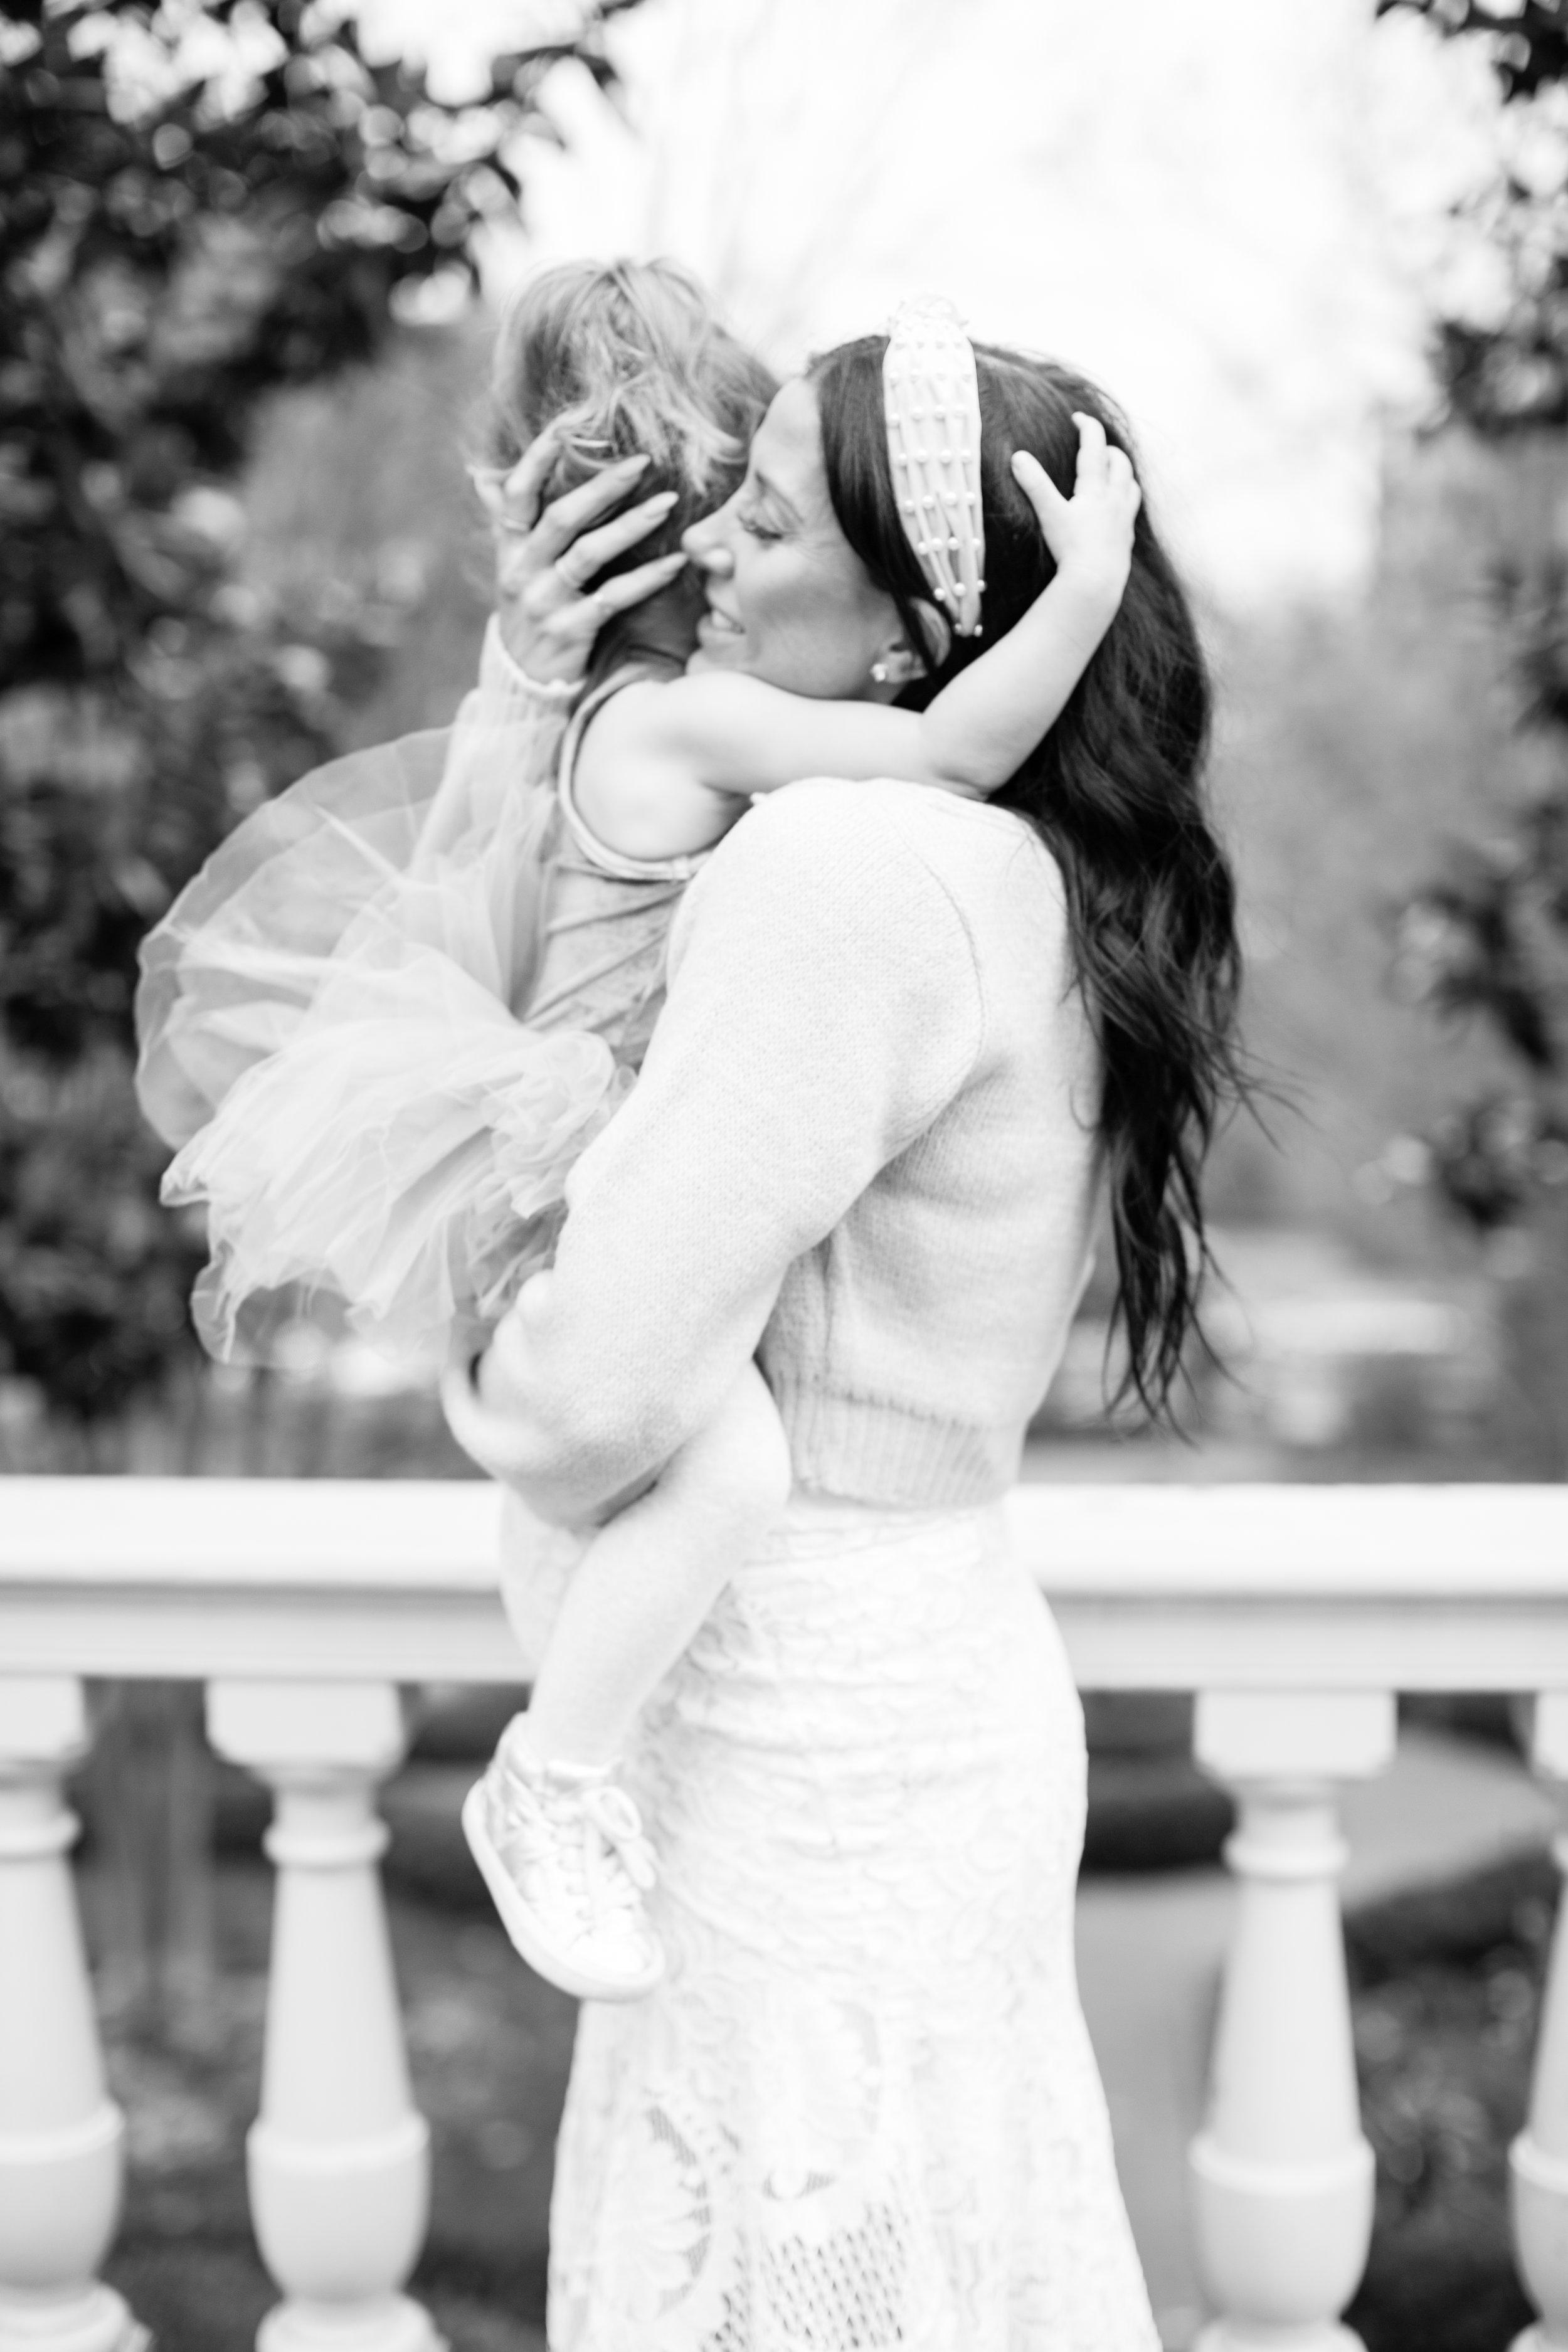 Maternity Family Photo Shoot DC Photographer Jessica Burdge_NatalieStrahorn_5